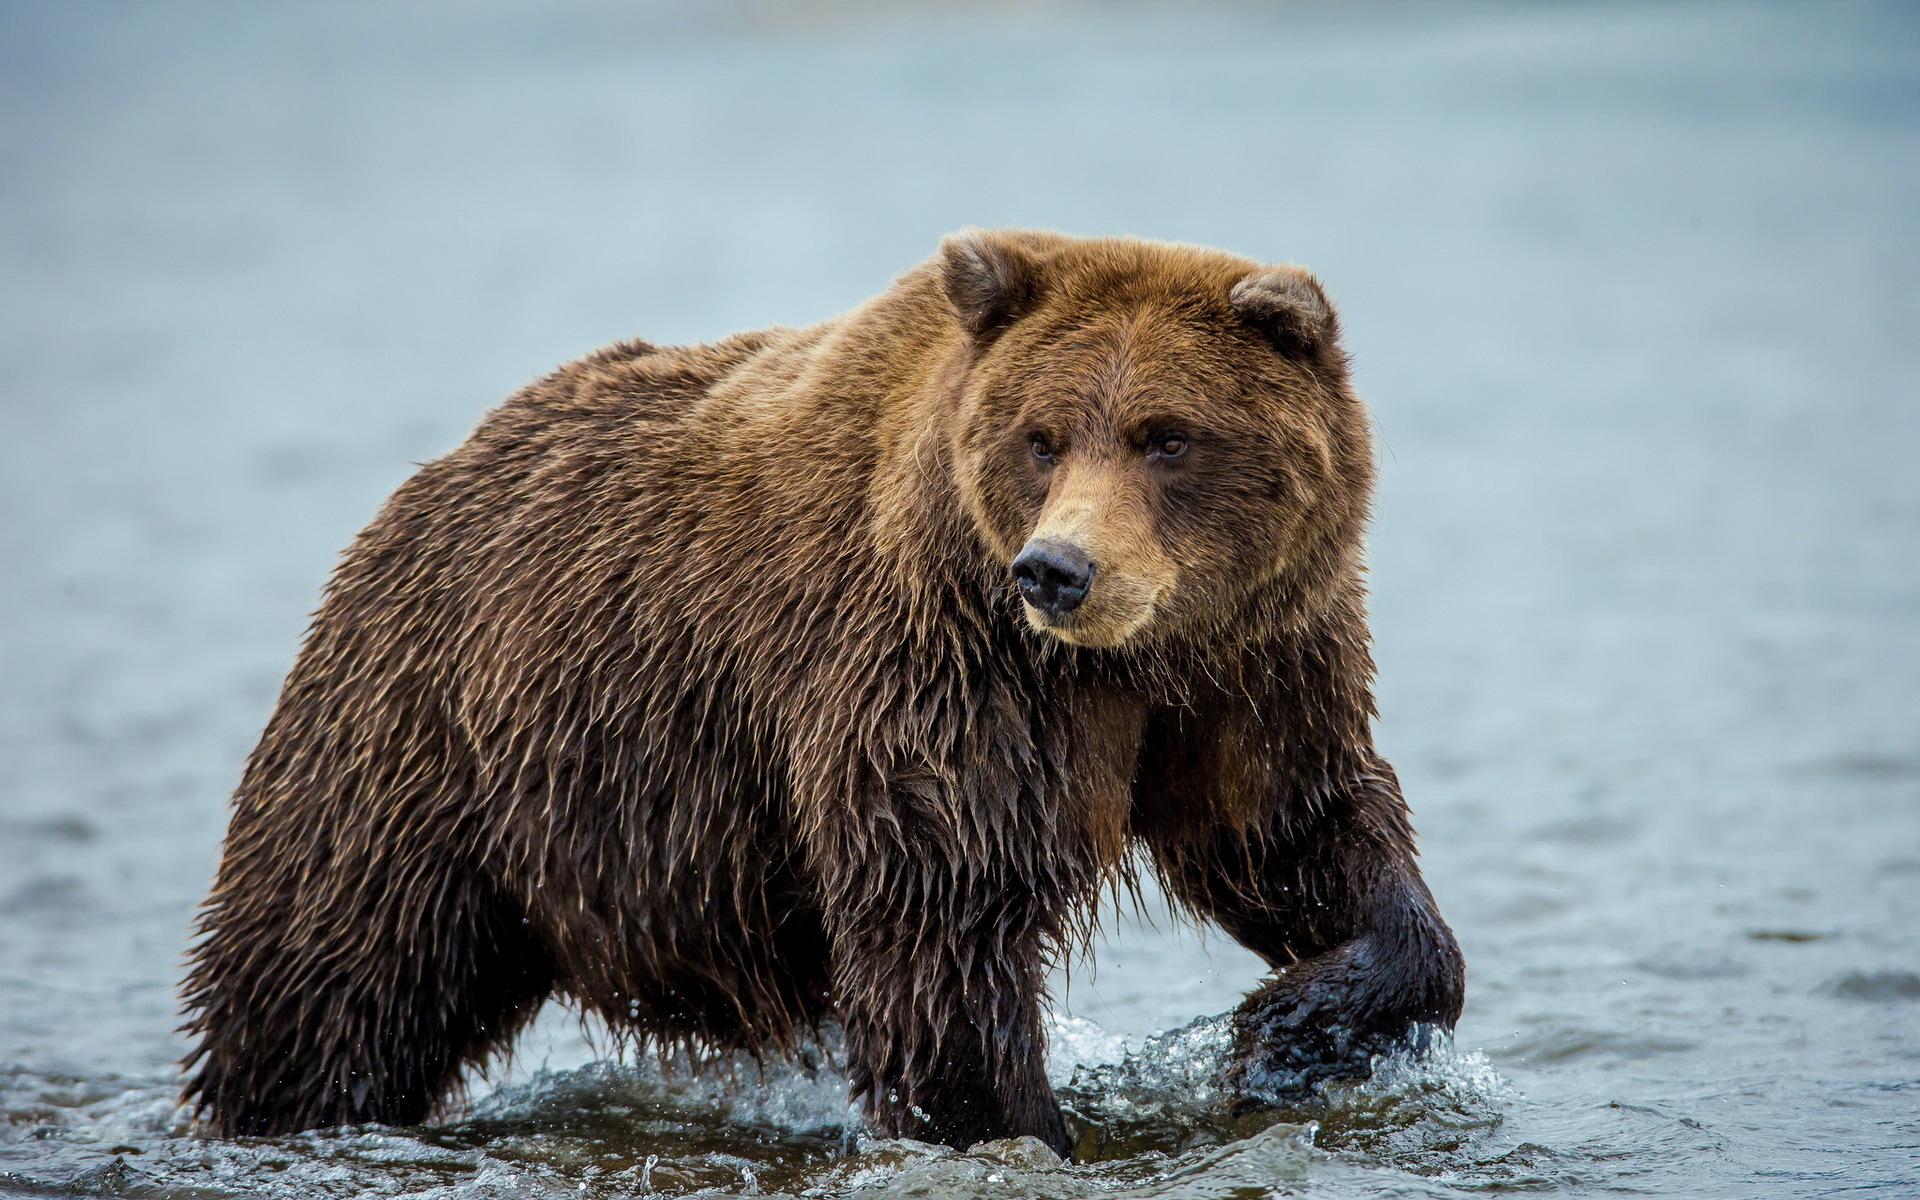 идущий медведь картинка тулеев заявил